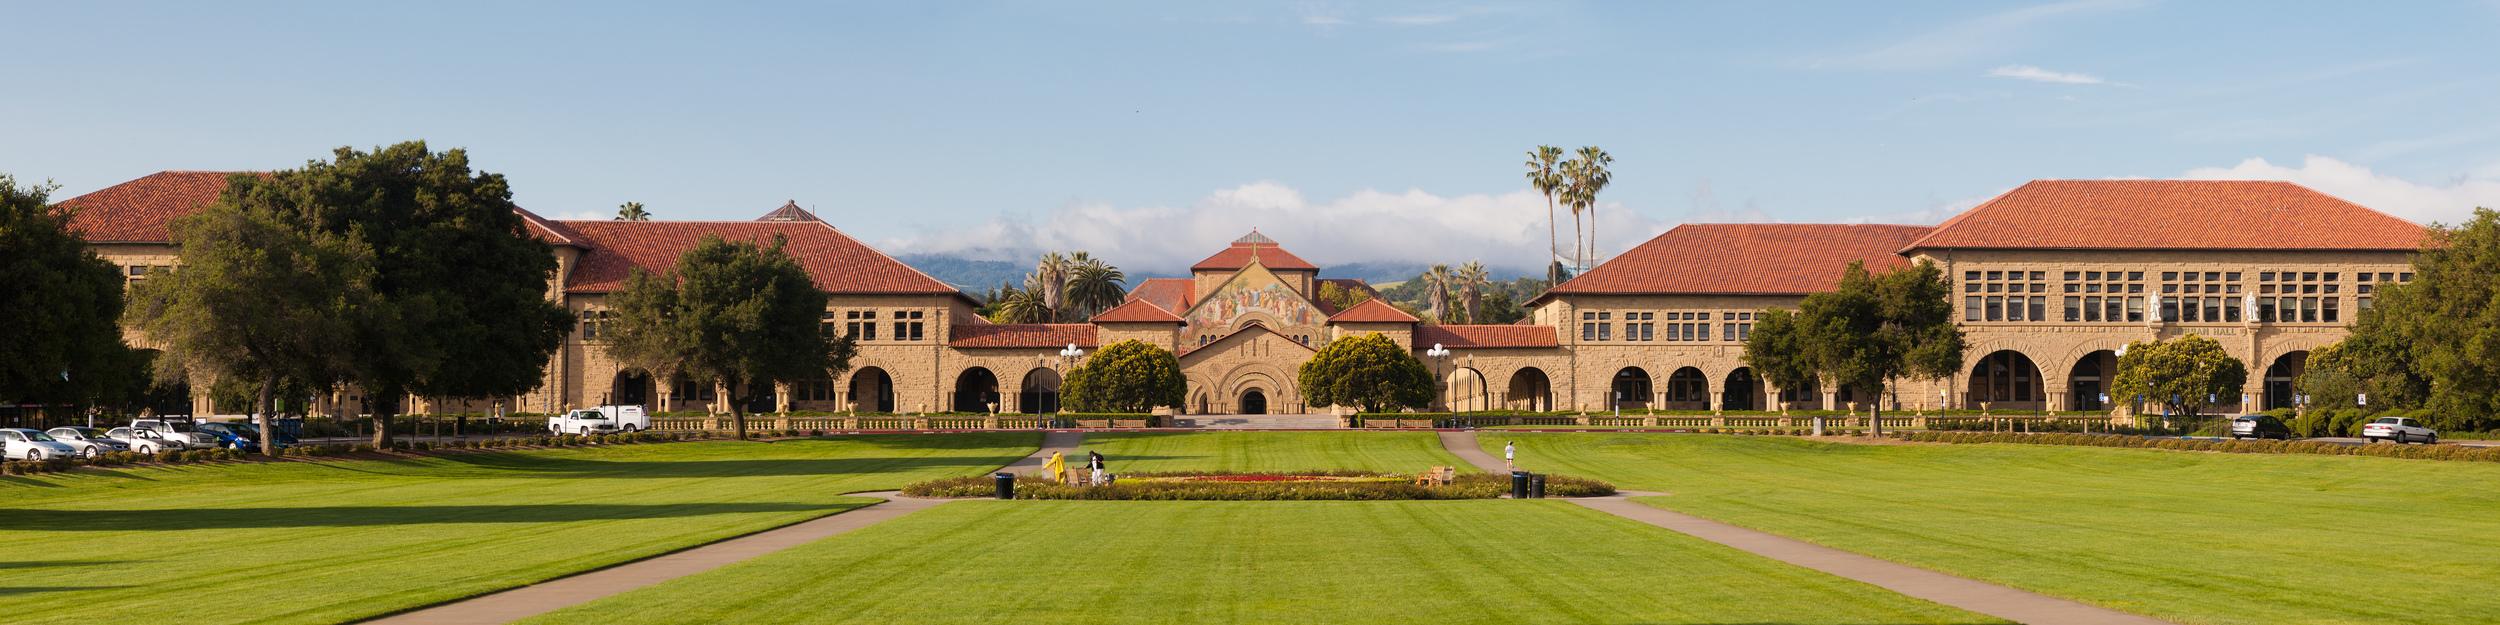 Image of Stanford University courtesy Wikipedia.